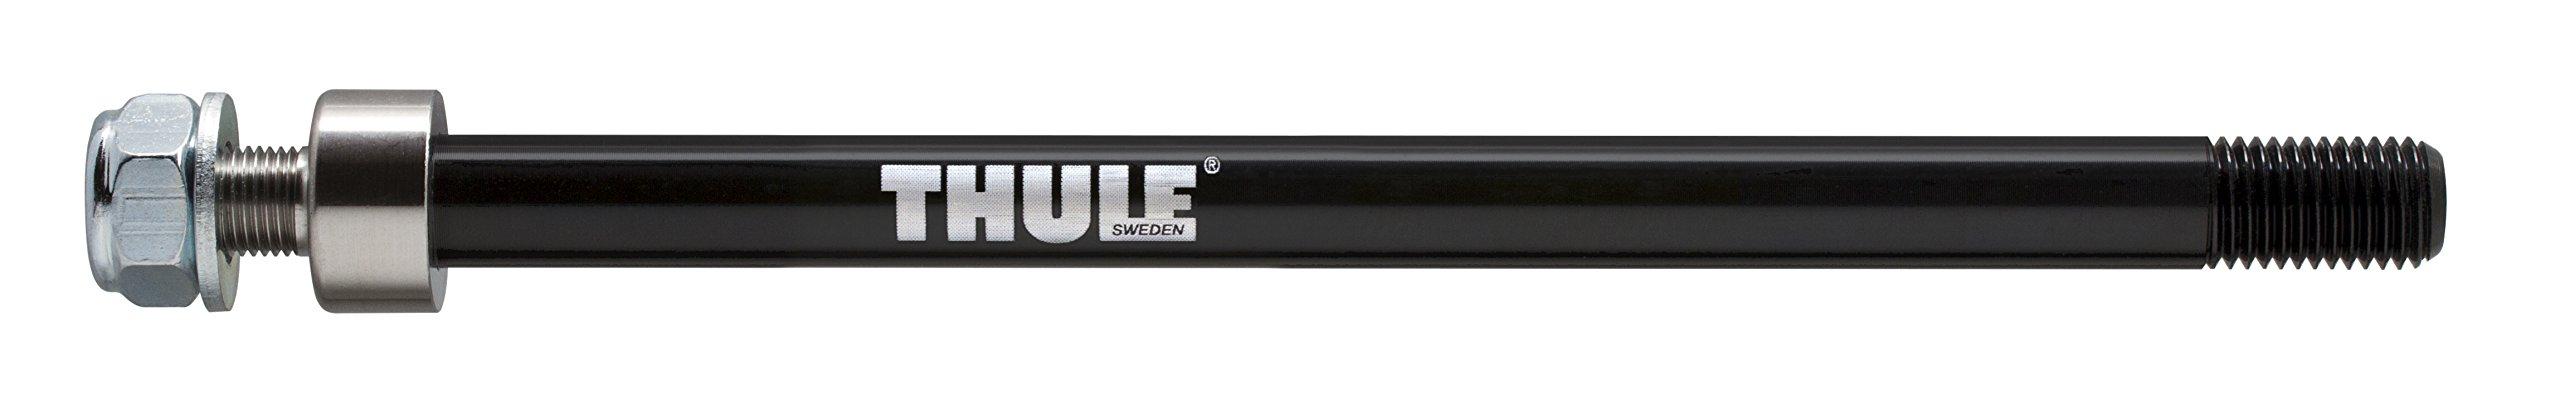 Thule Thru Axle 217/229mm (M12X1.0) Bike Child Seats/Fat Bike